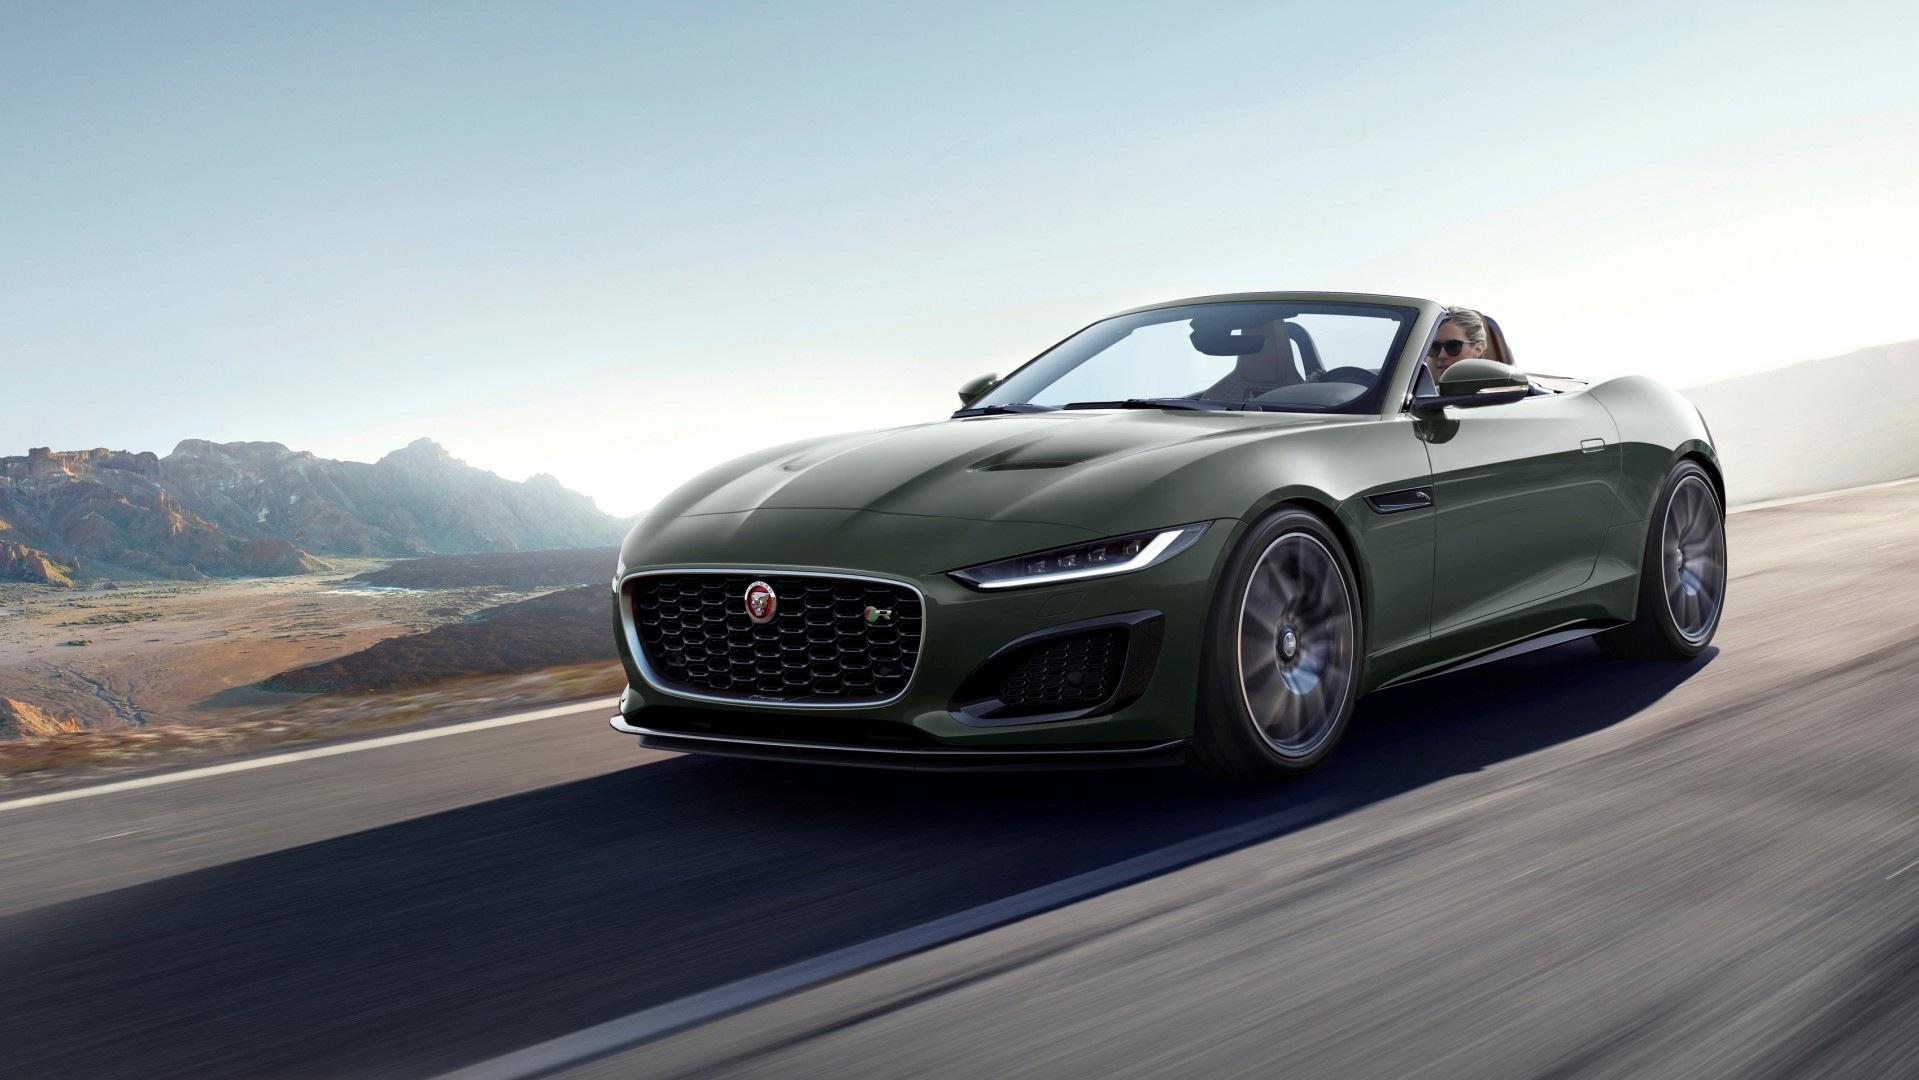 El Jaguar F-Type Heritage 60 Edition apela a la nostalgia británica